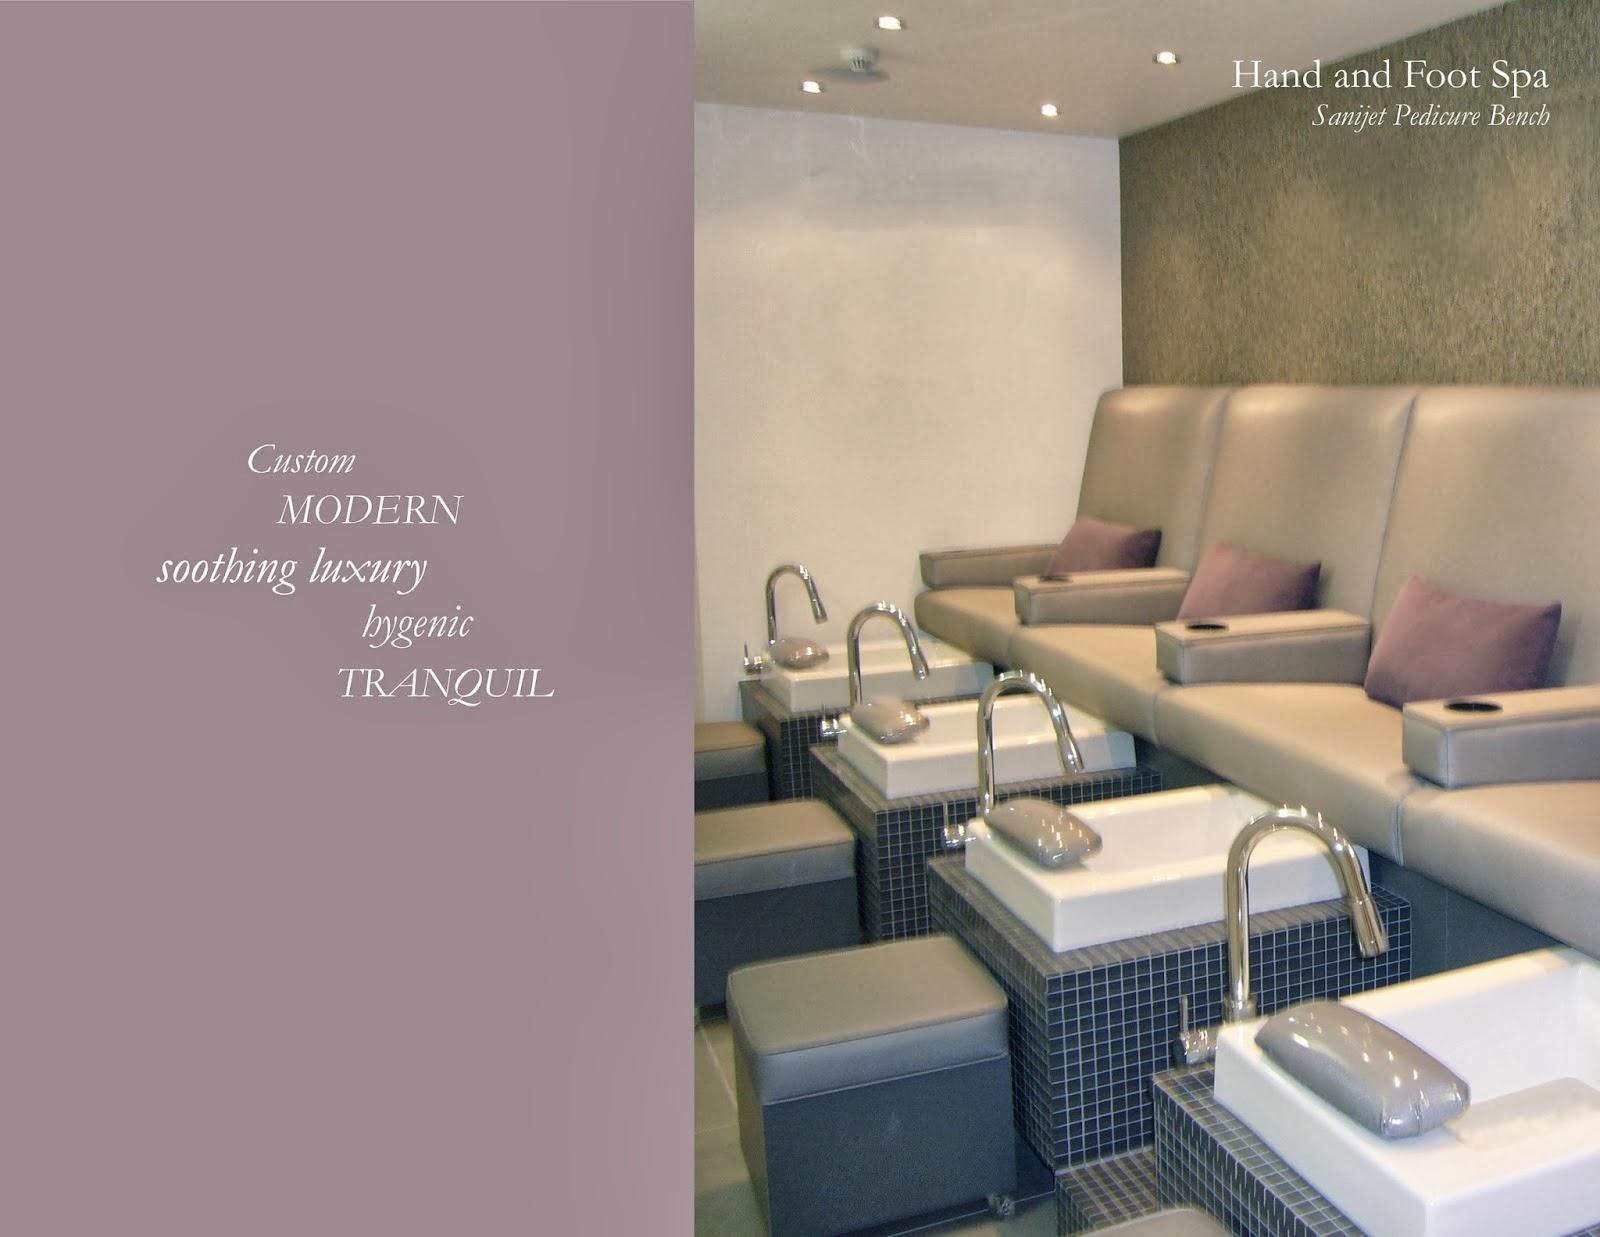 Michele pelafas furniture design manufacturing for Salon spa